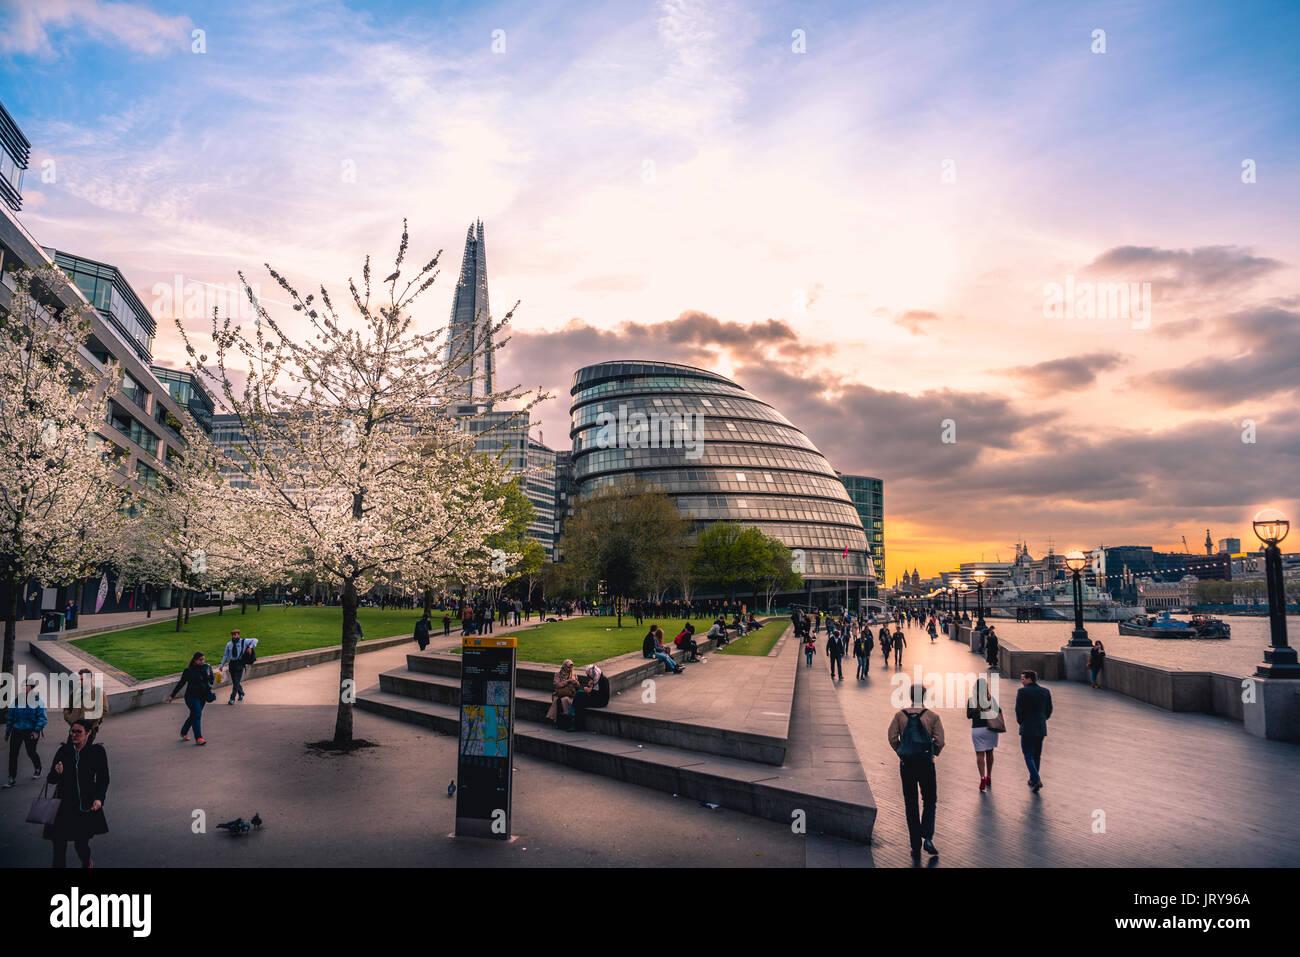 Passeggiata sul Tamigi, Potters Fields Park, Skyline, London City Hall, Shard, al tramonto, Southwark, Londra, Inghilterra Immagini Stock